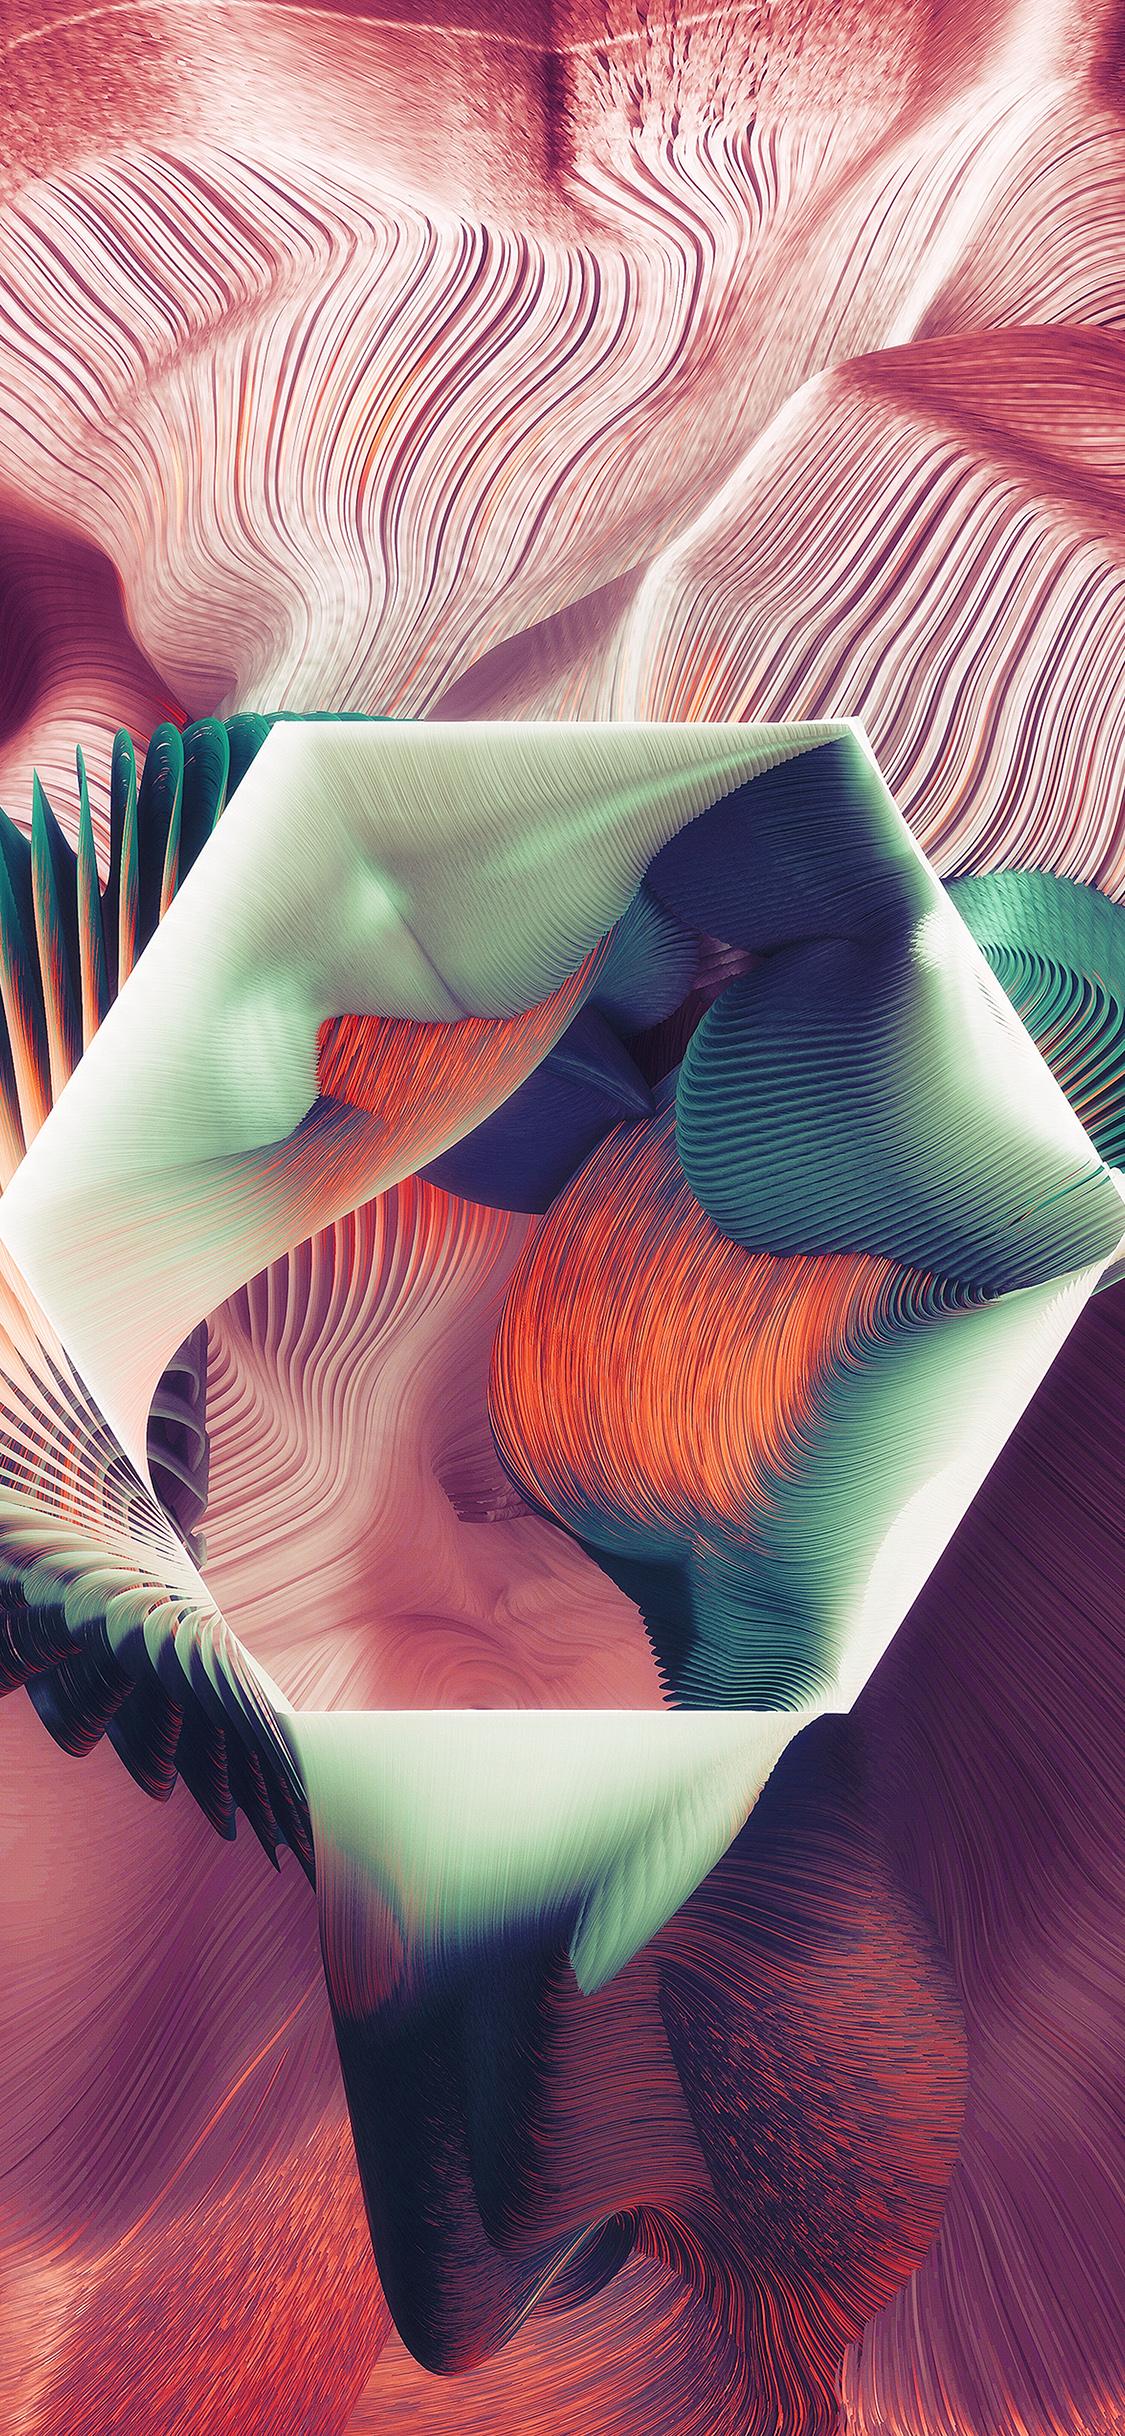 iPhoneXpapers.com-Apple-iPhone-wallpaper-ar73-polagon-plums-ari-weinkle-art-illustration-pattern-blue